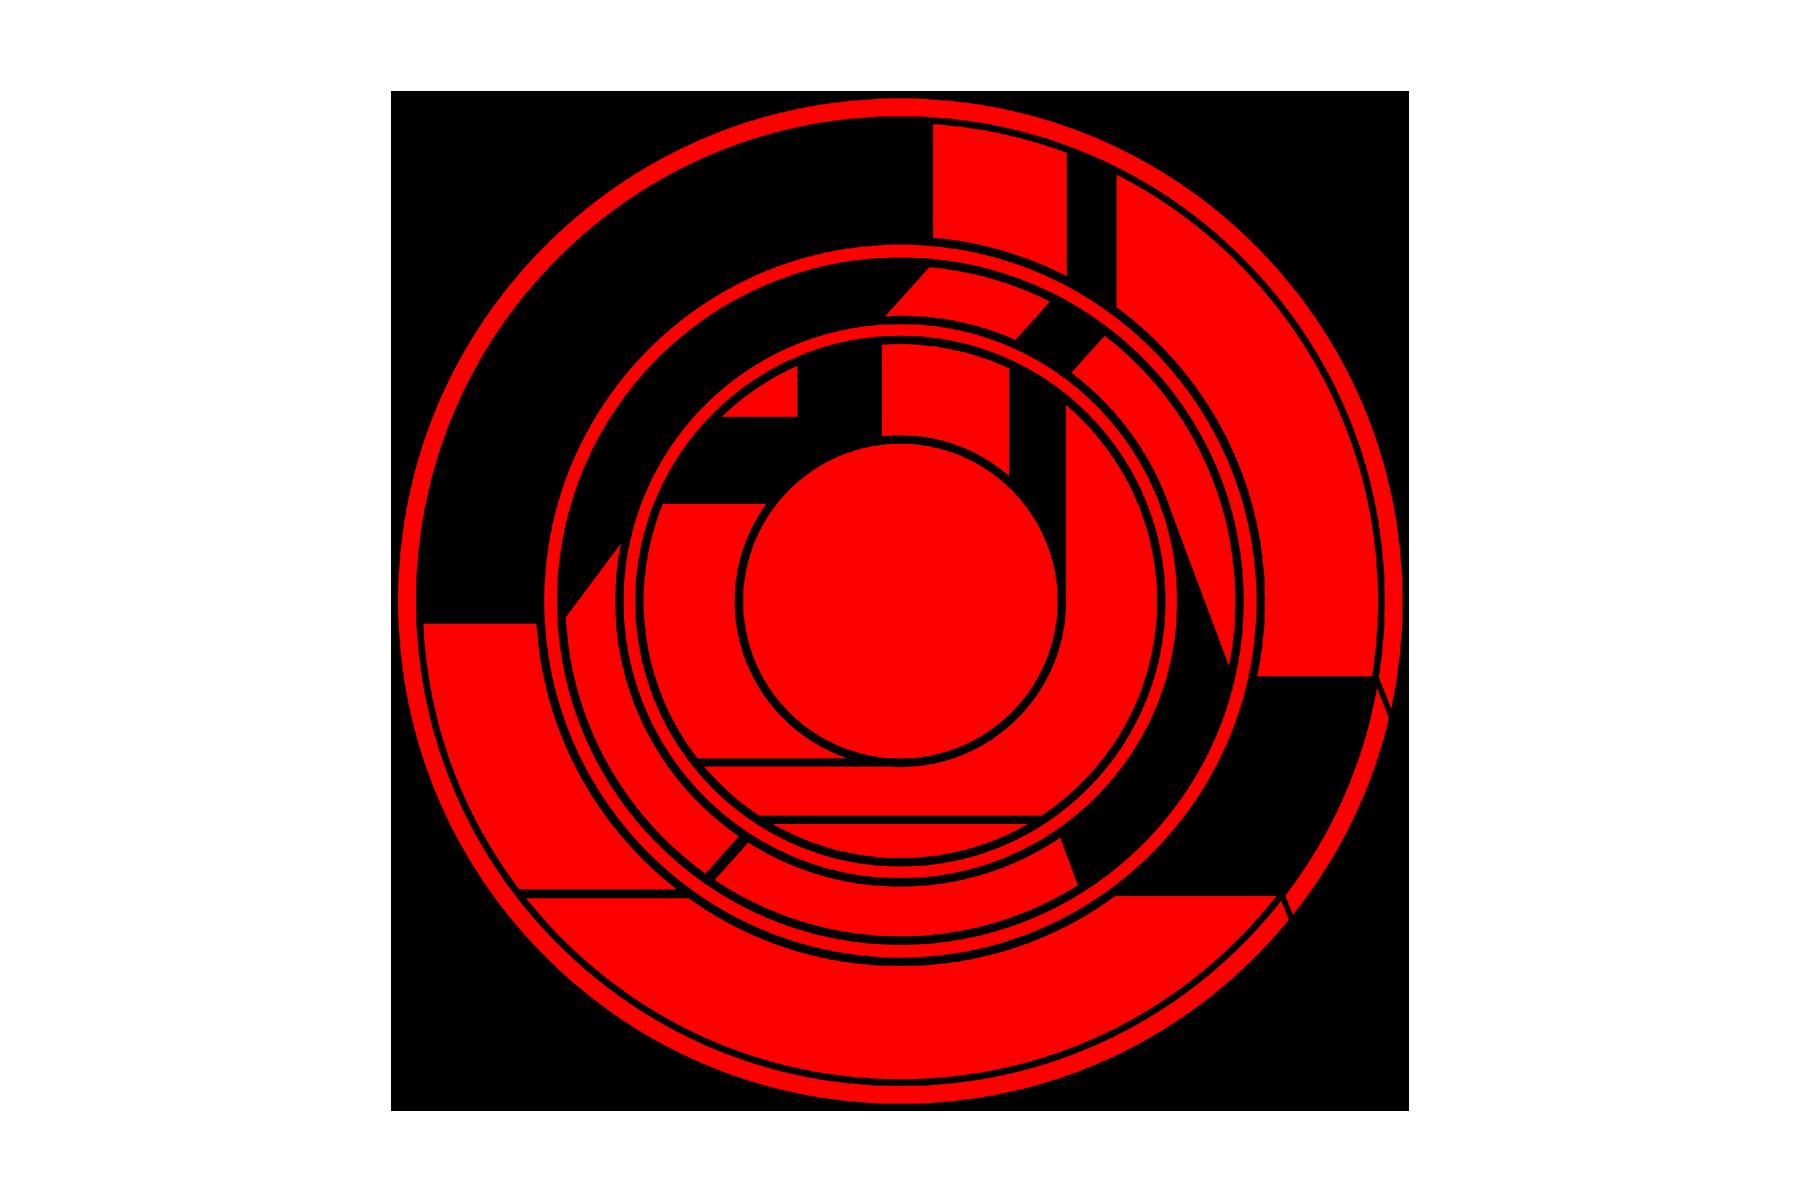 Enveloppe 2020 | Circular Paintings